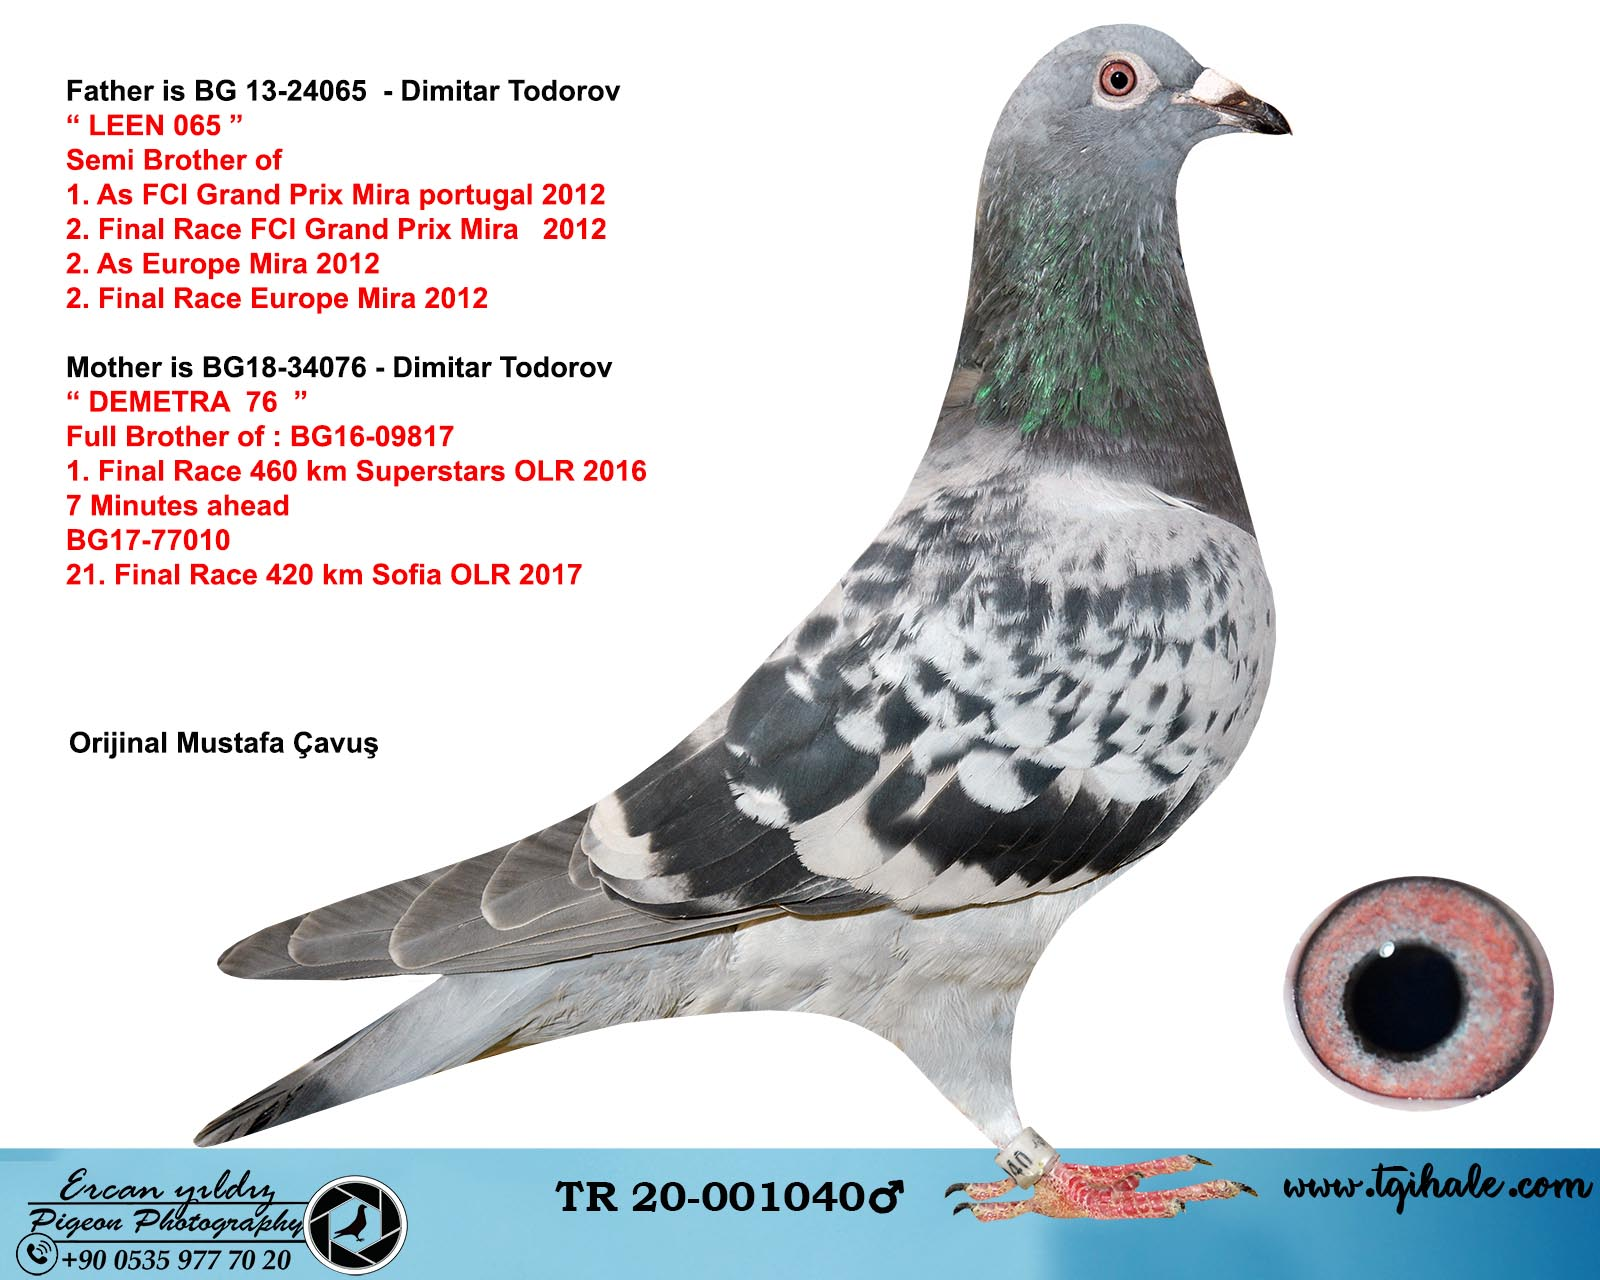 TR20-001040 ERKEK / BABASI LEEN 739 OGLU ANNESI 1. FİNAL 460 SUPERSTAR DIMITAR TODOROV % 100